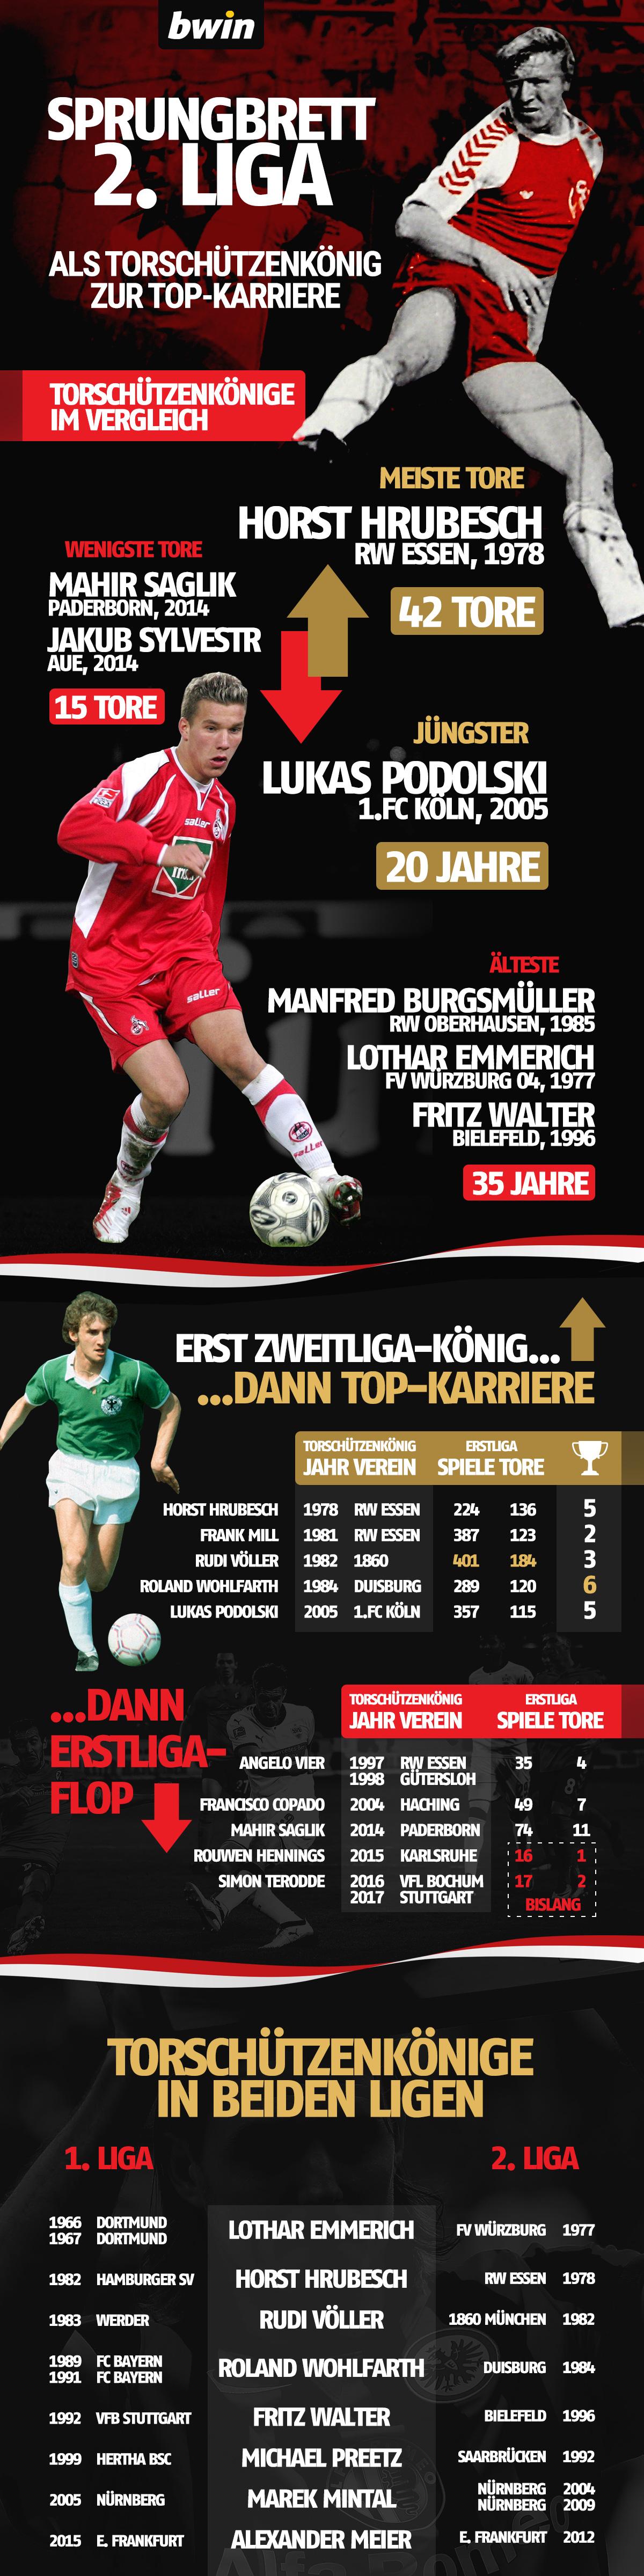 Torschützenkönig 2 Bundesliga